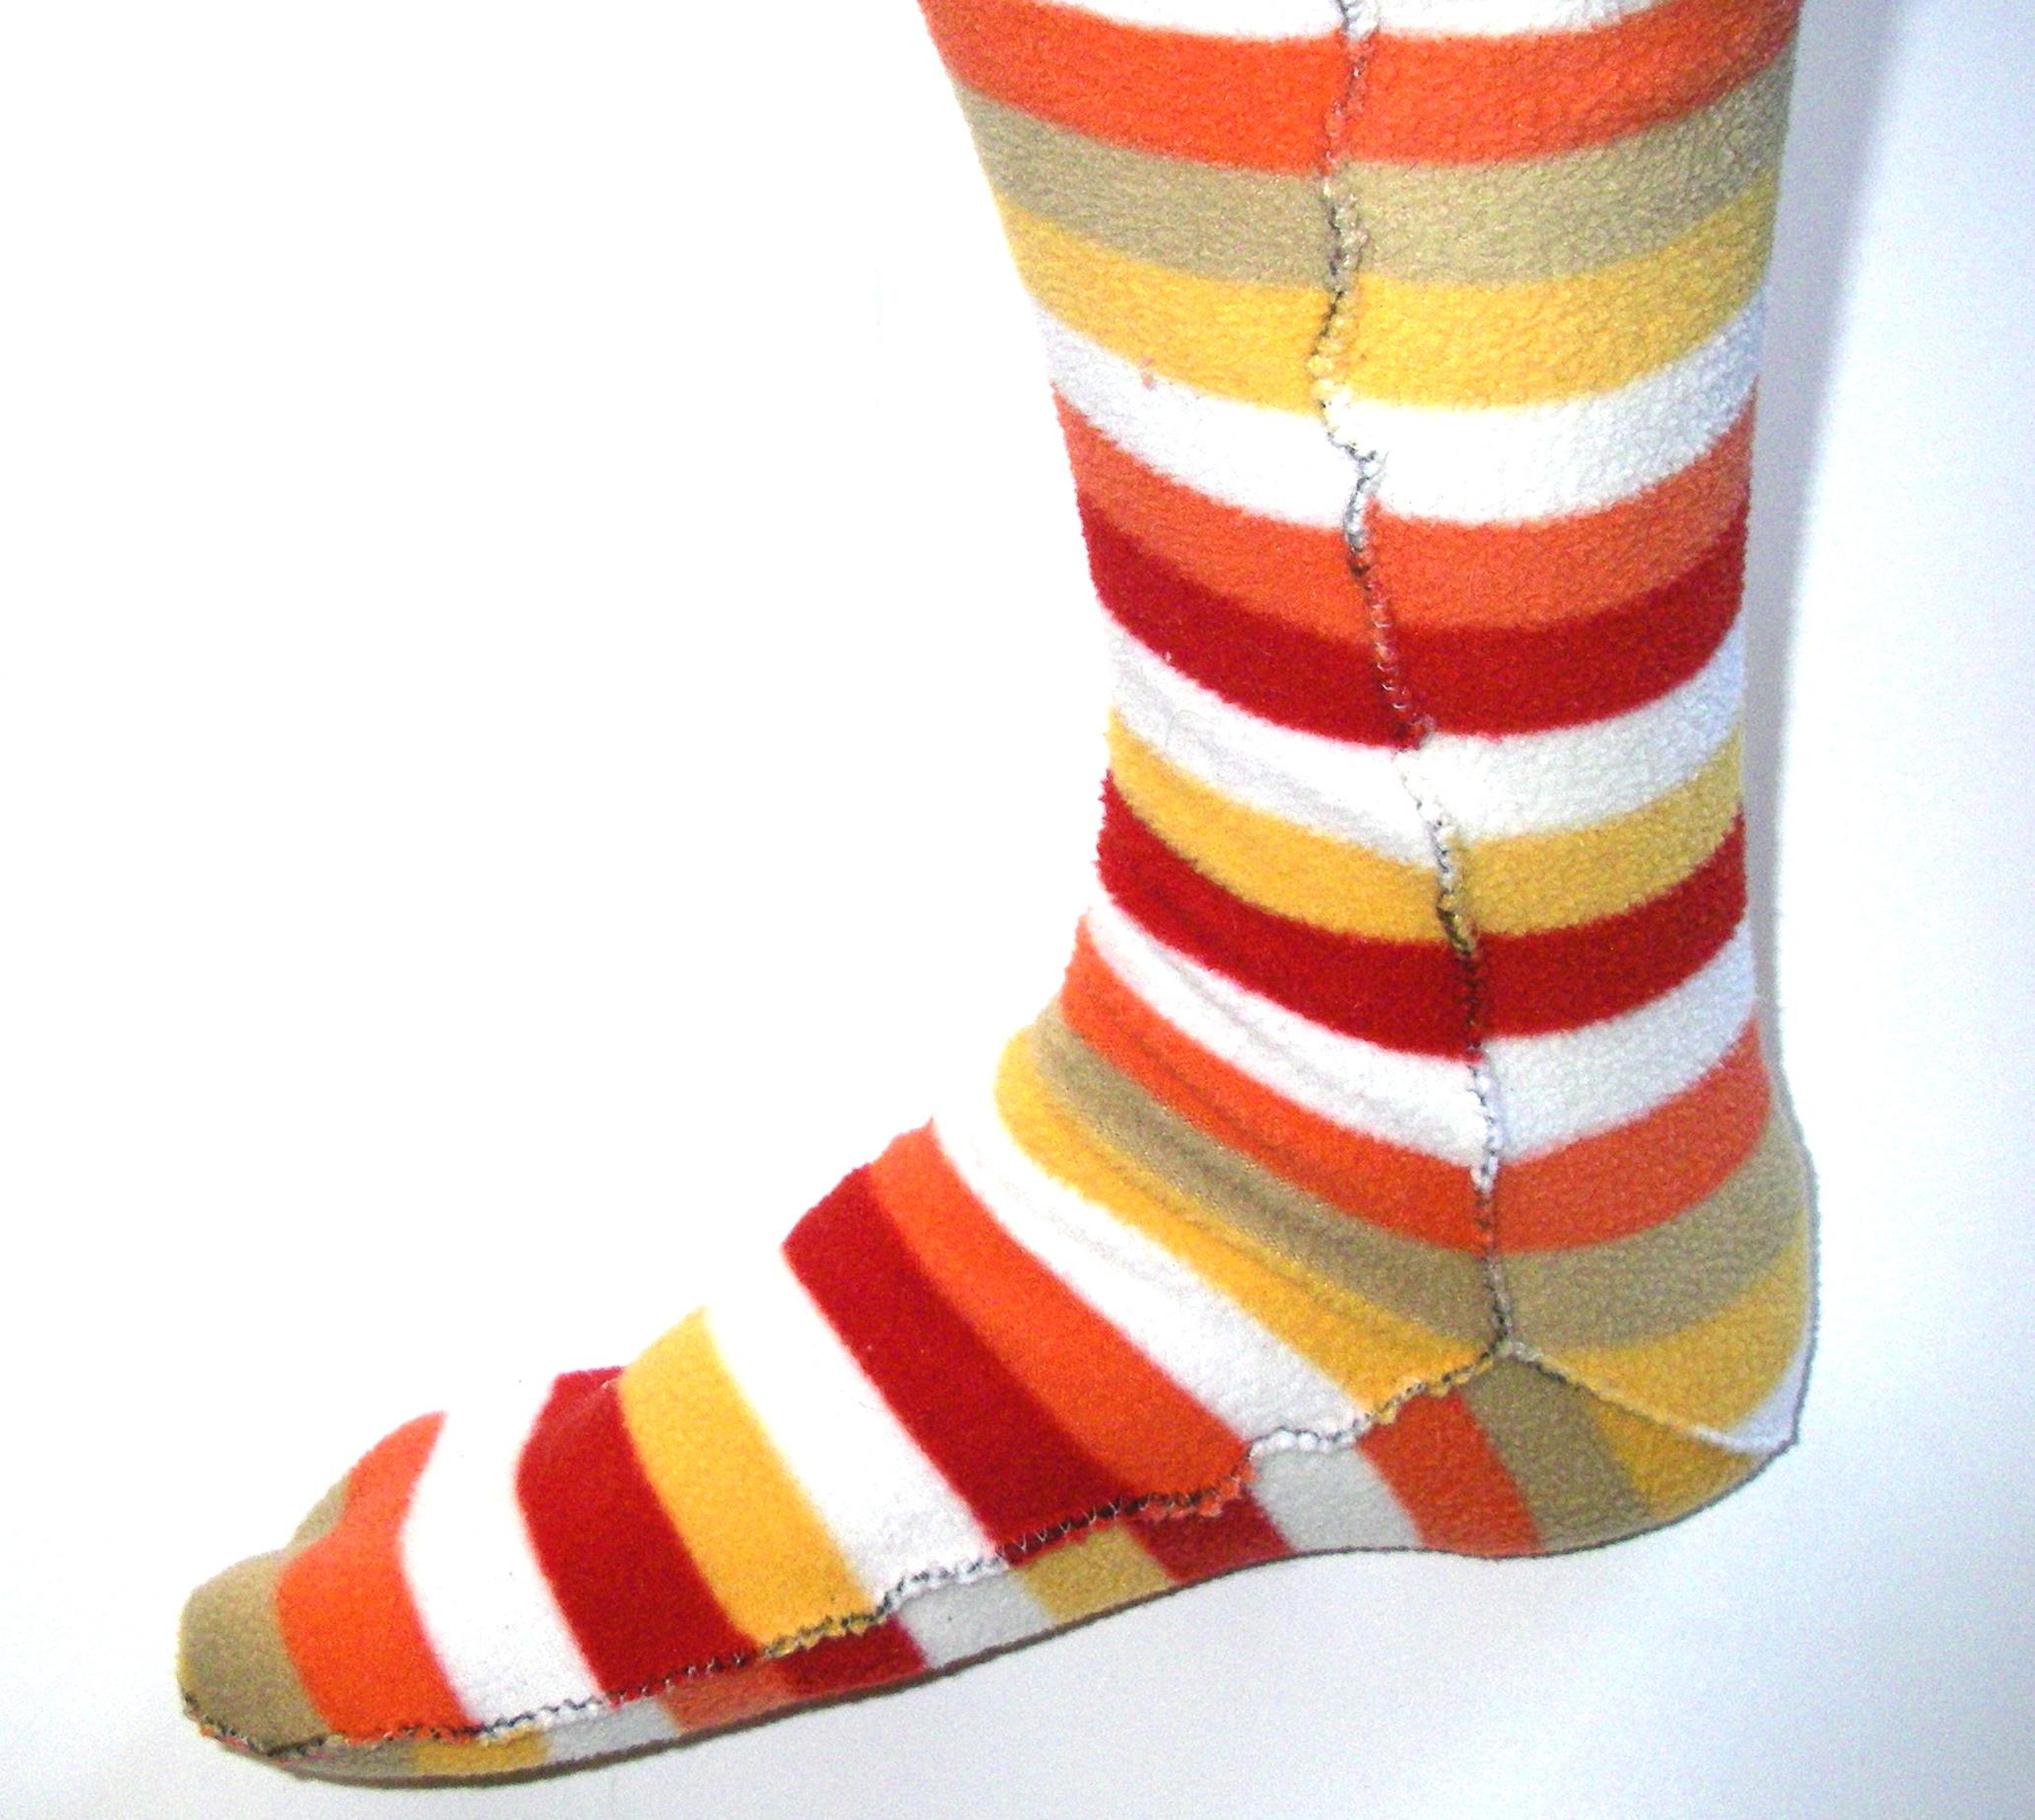 Cozy Socks from Polarfleece Blanket